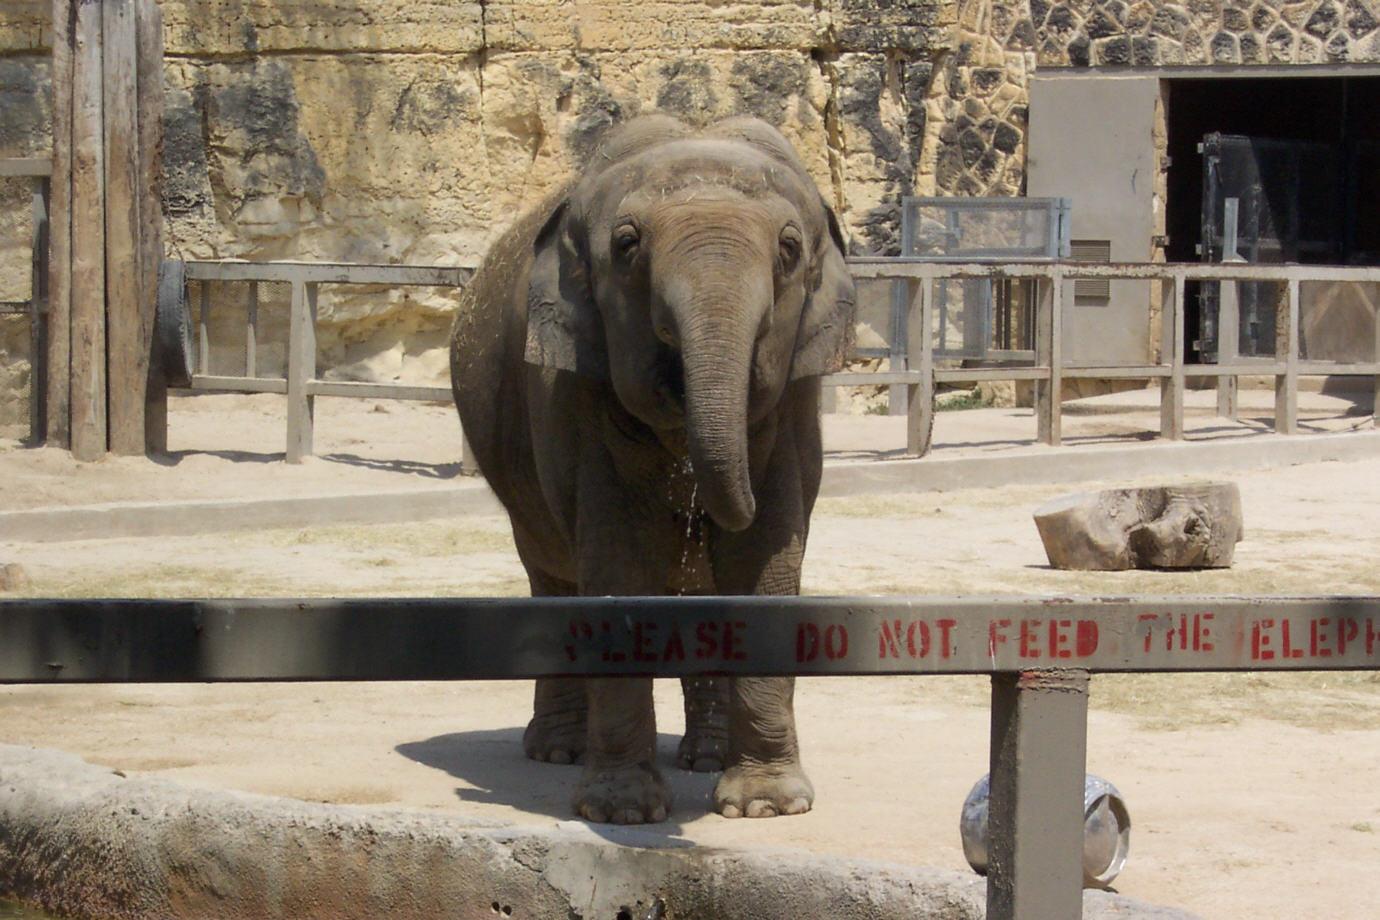 Lagniappe San Antonio Zoo Photographs